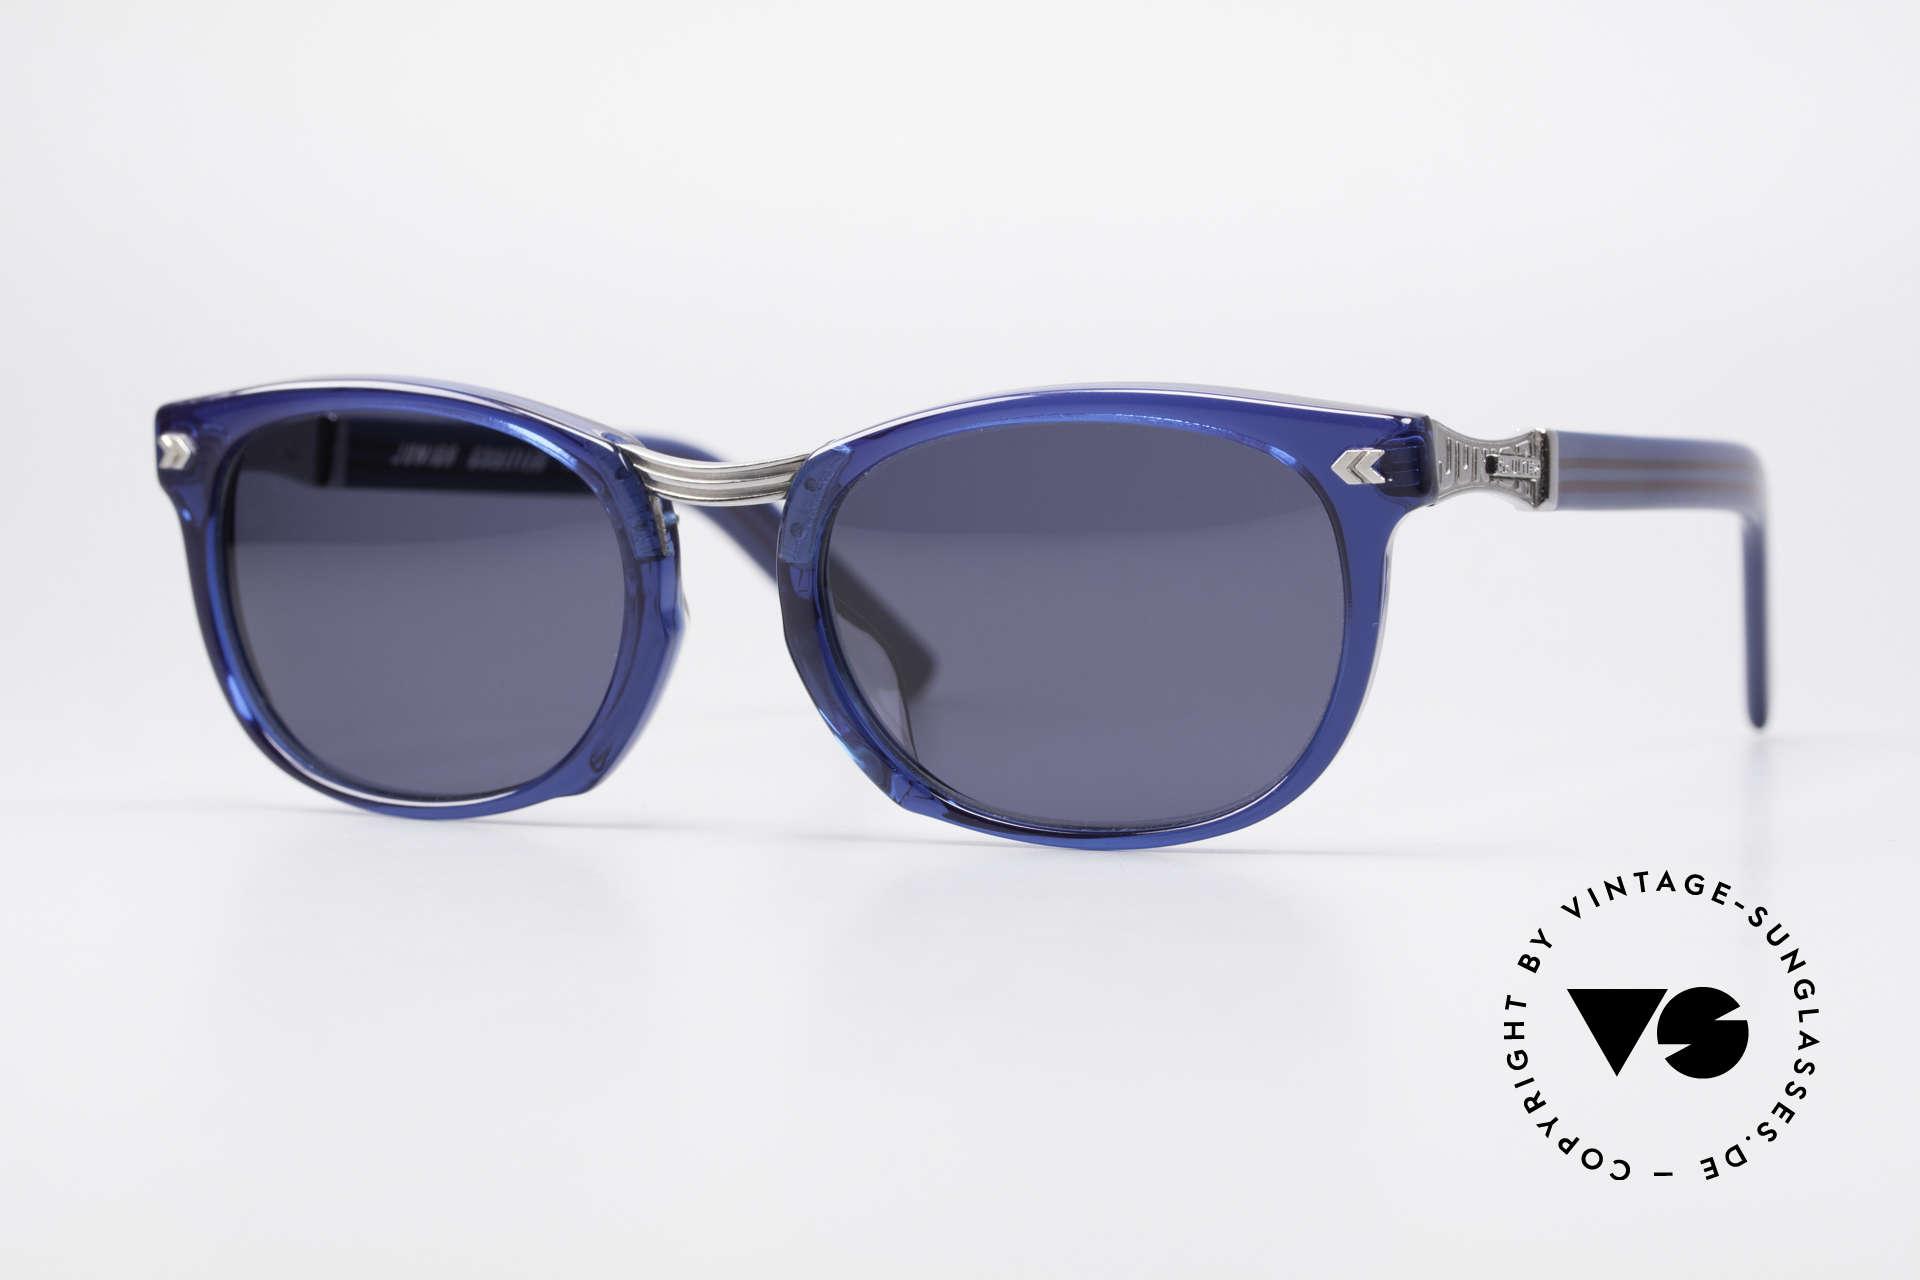 Jean Paul Gaultier 58-1271 Junior Gaultier Sunglasses, spectacular Jean Paul GAULTIER 90's designer shades, Made for Men and Women